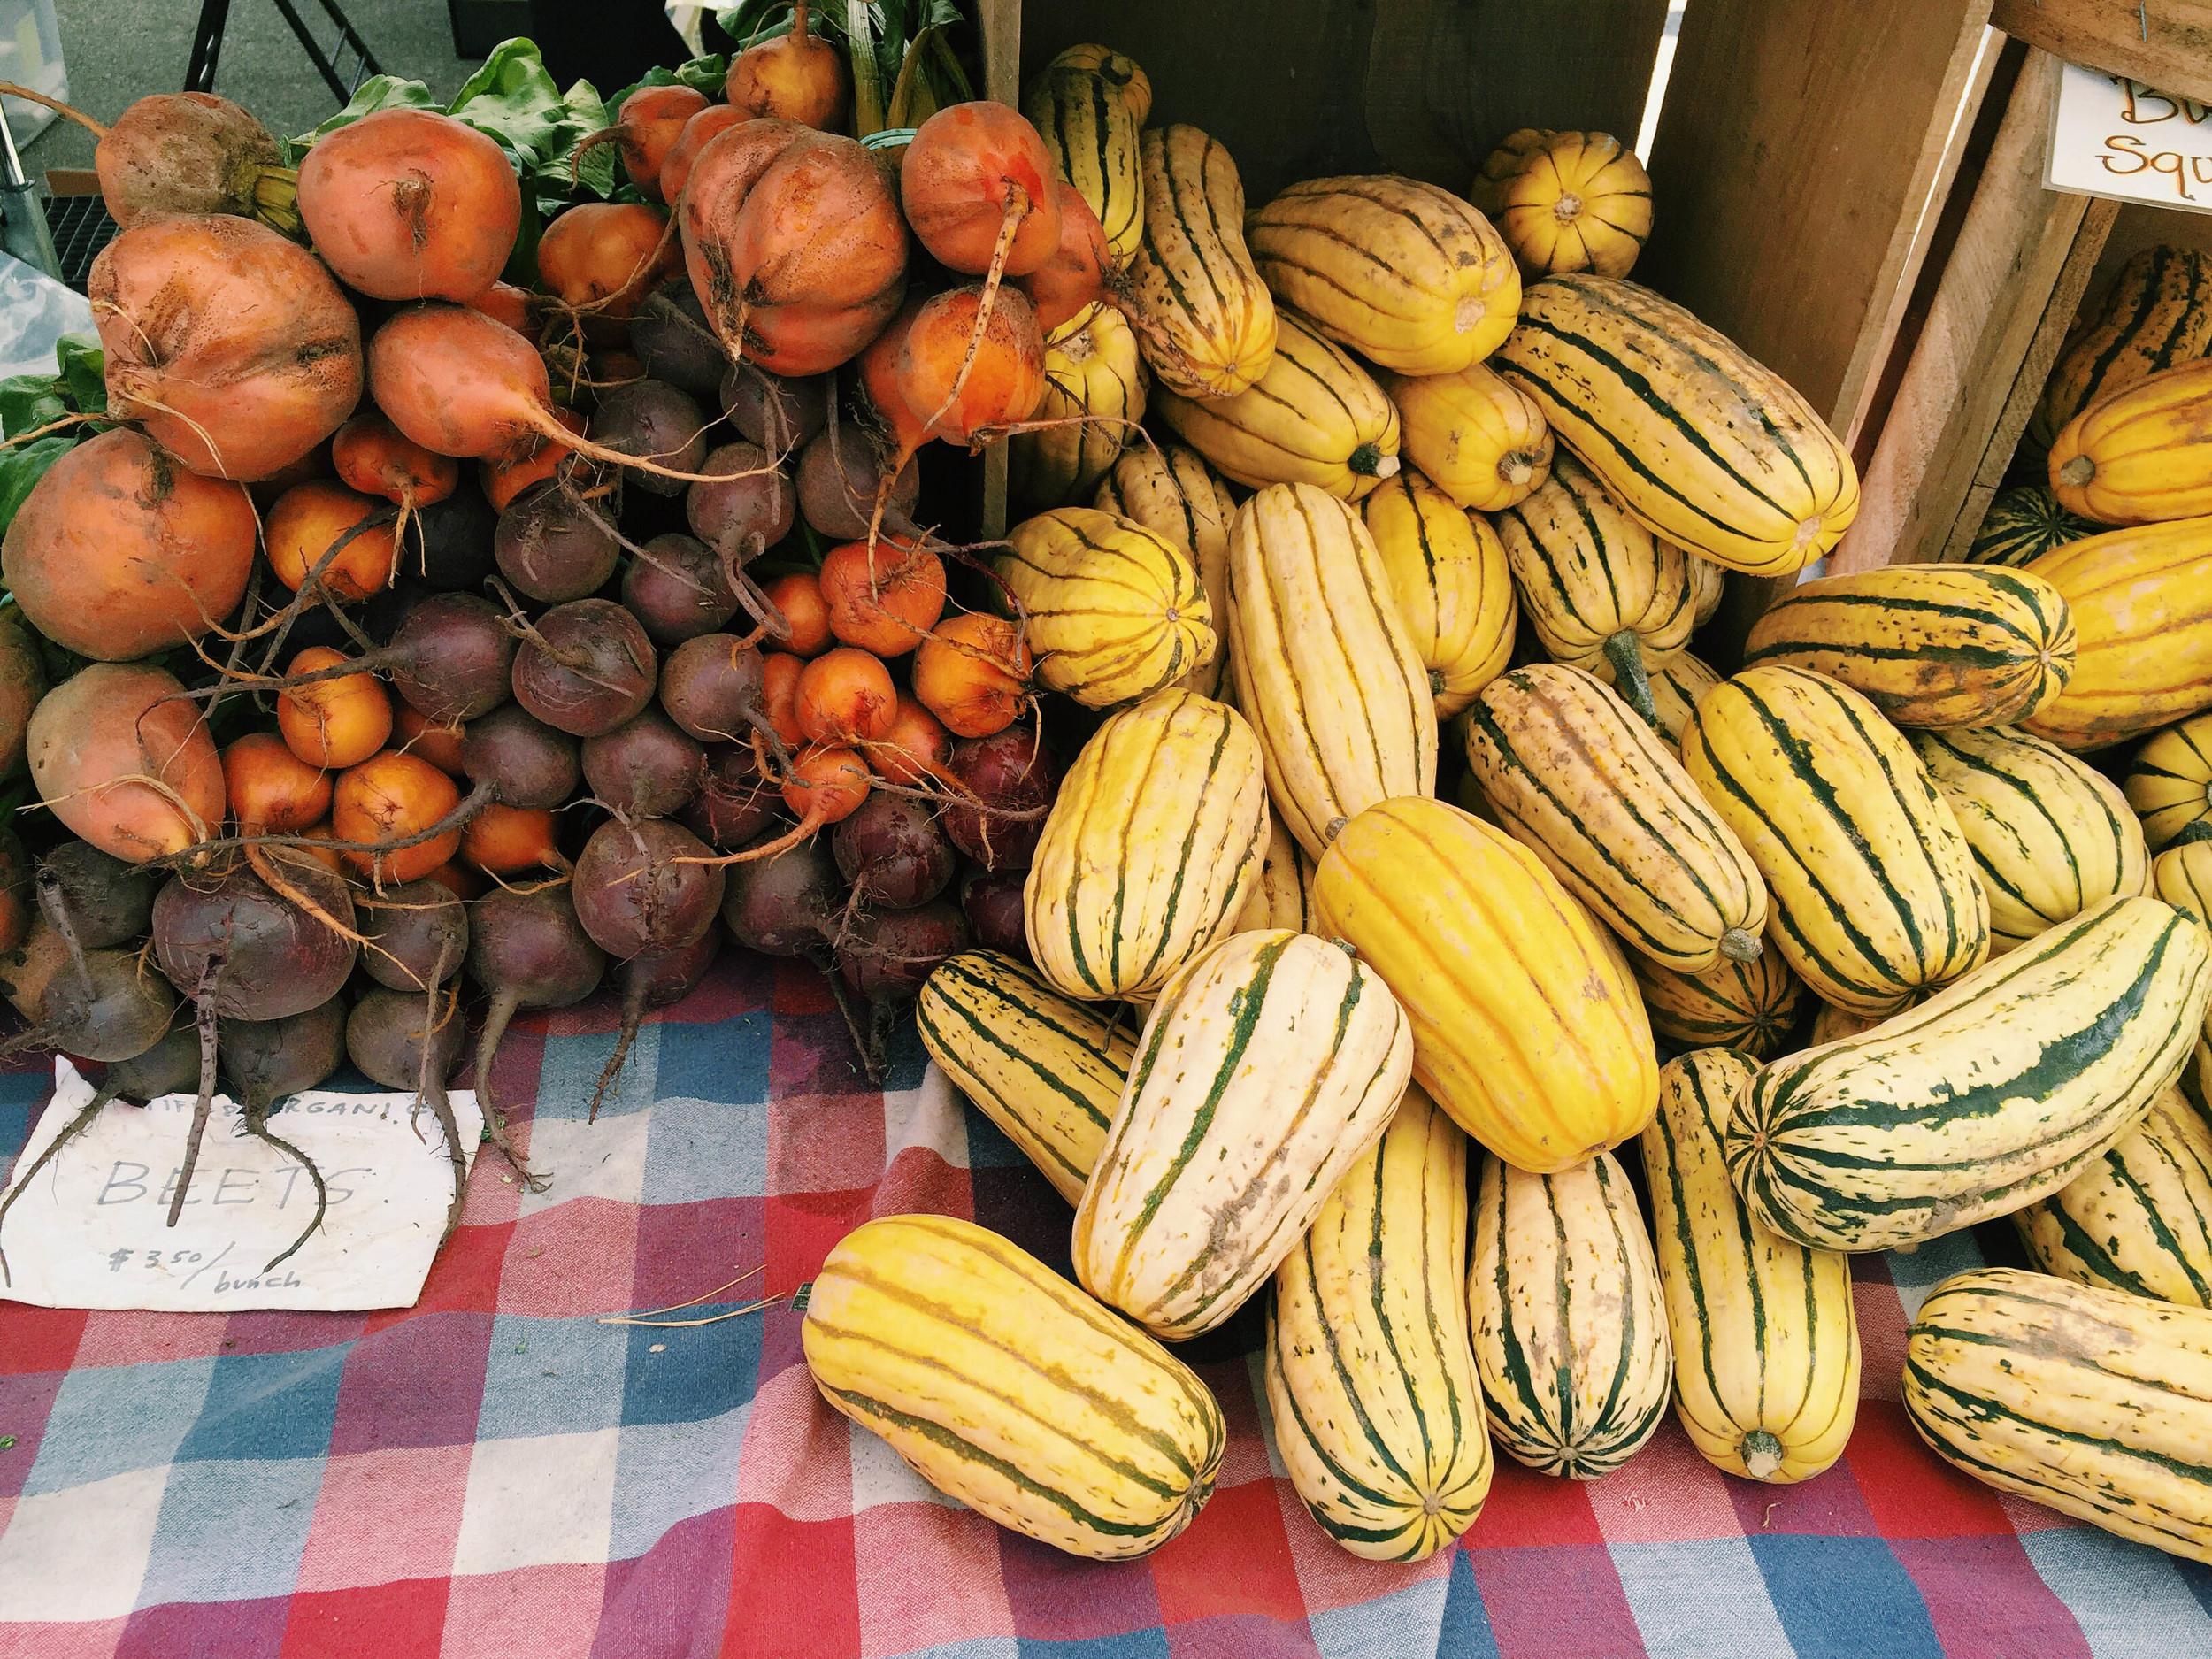 {Some gorgeous veggies at the SoWa farmers market}